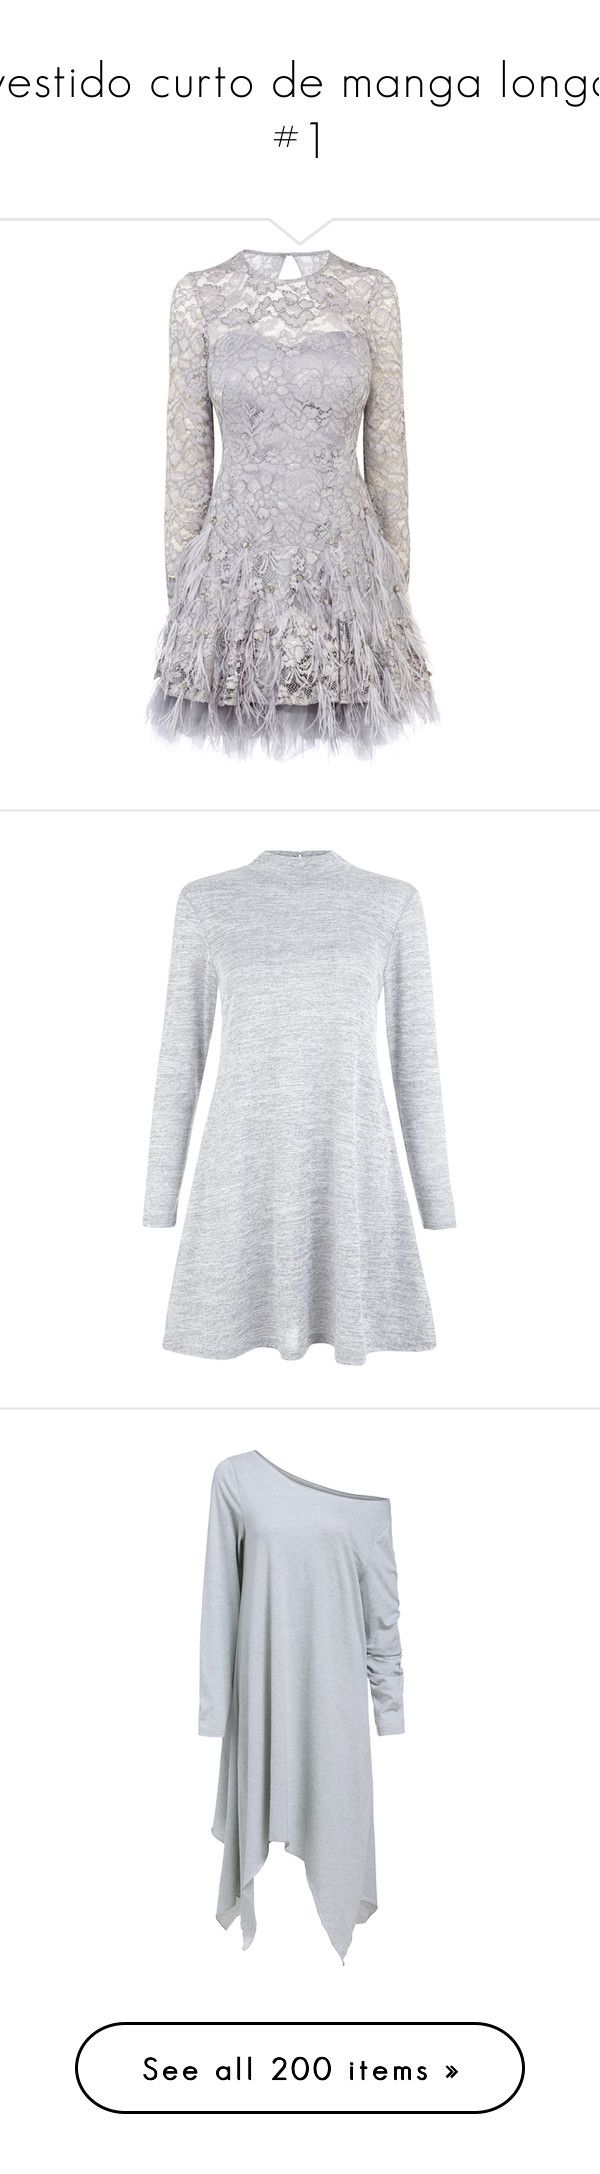 """vestido curto de manga longa #1"" by kaliane-espanavelli-lobo ❤ liked on Polyvore featuring dresses, vestidos, short dresses, grey, naturals, gray cocktail dress, gray lace dress, grey dress, grey lace dress and grey swing dress"